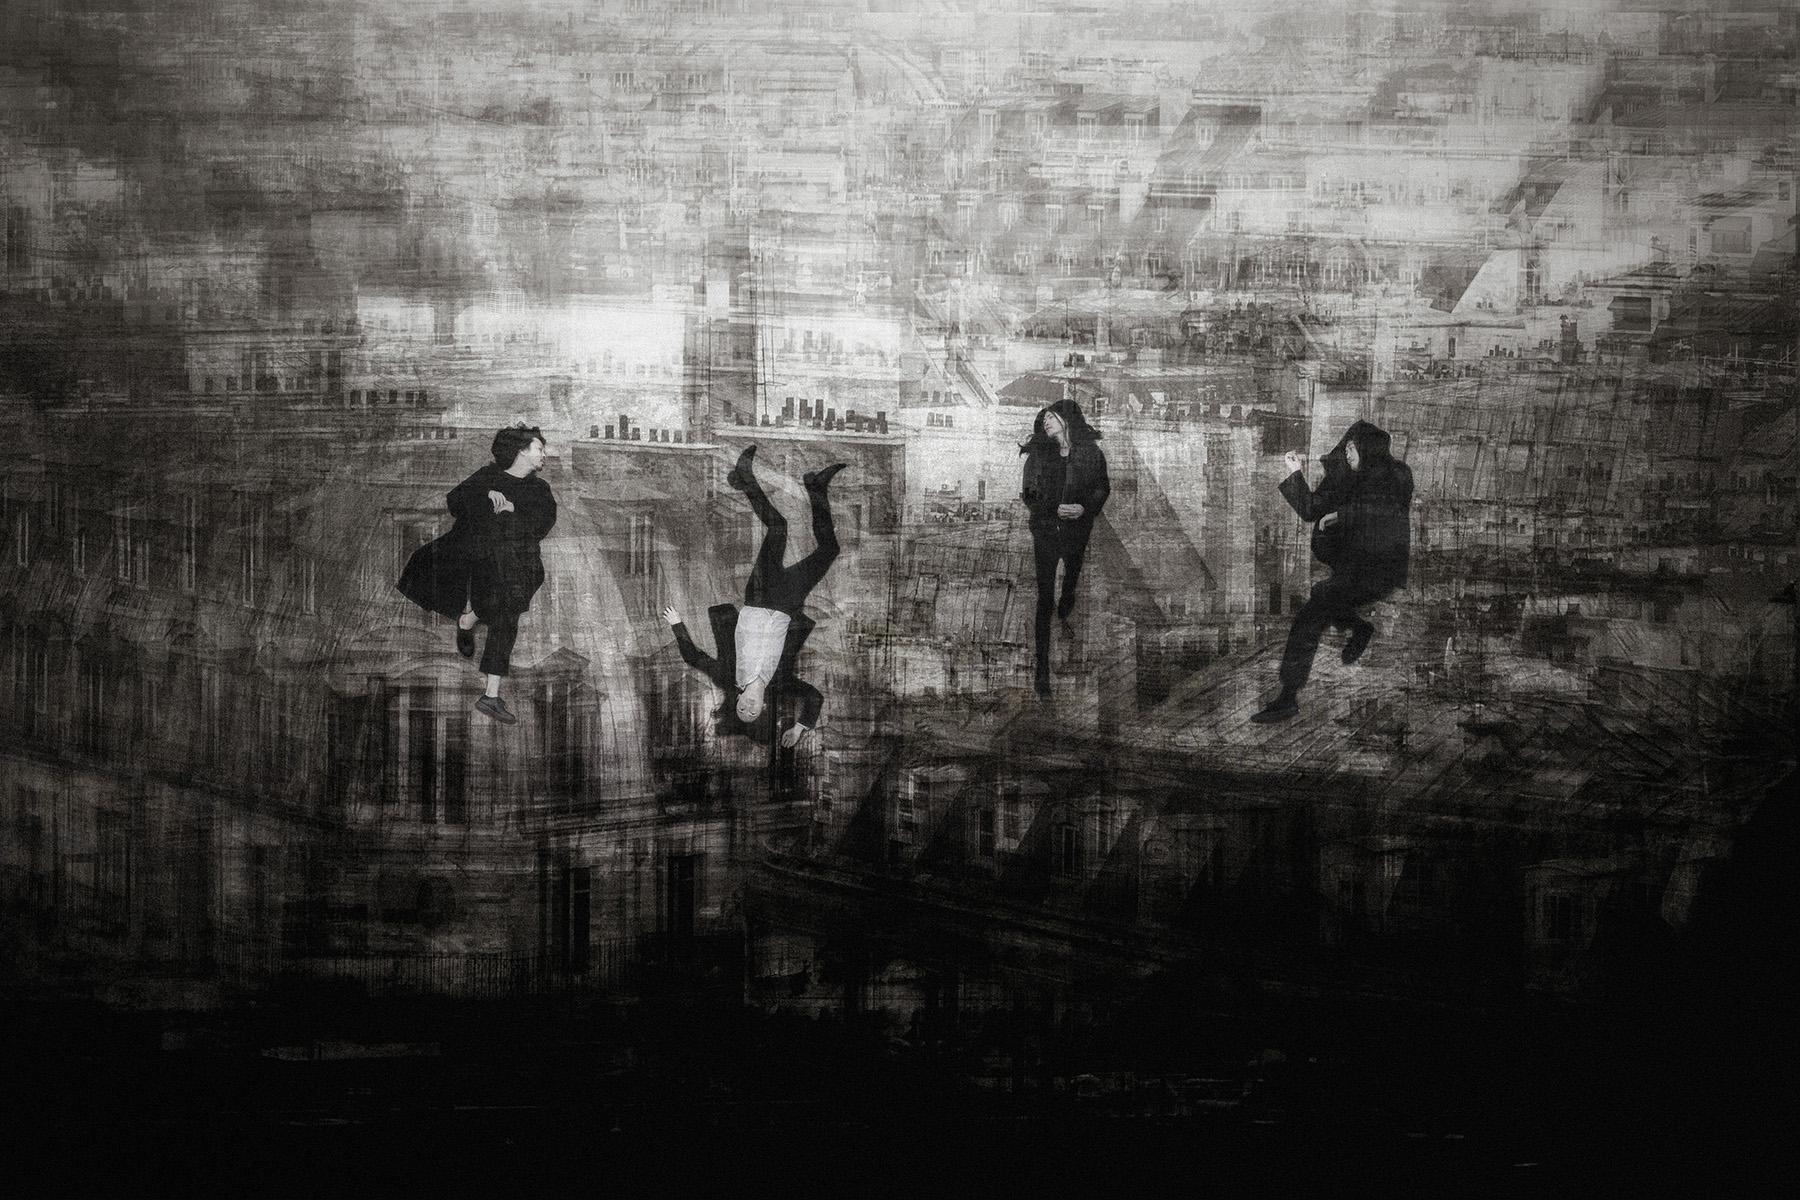 THE NOVEMBERSが5月リリースの新作EP『TODAY』より「みんな急いでいる」のMVを公開!